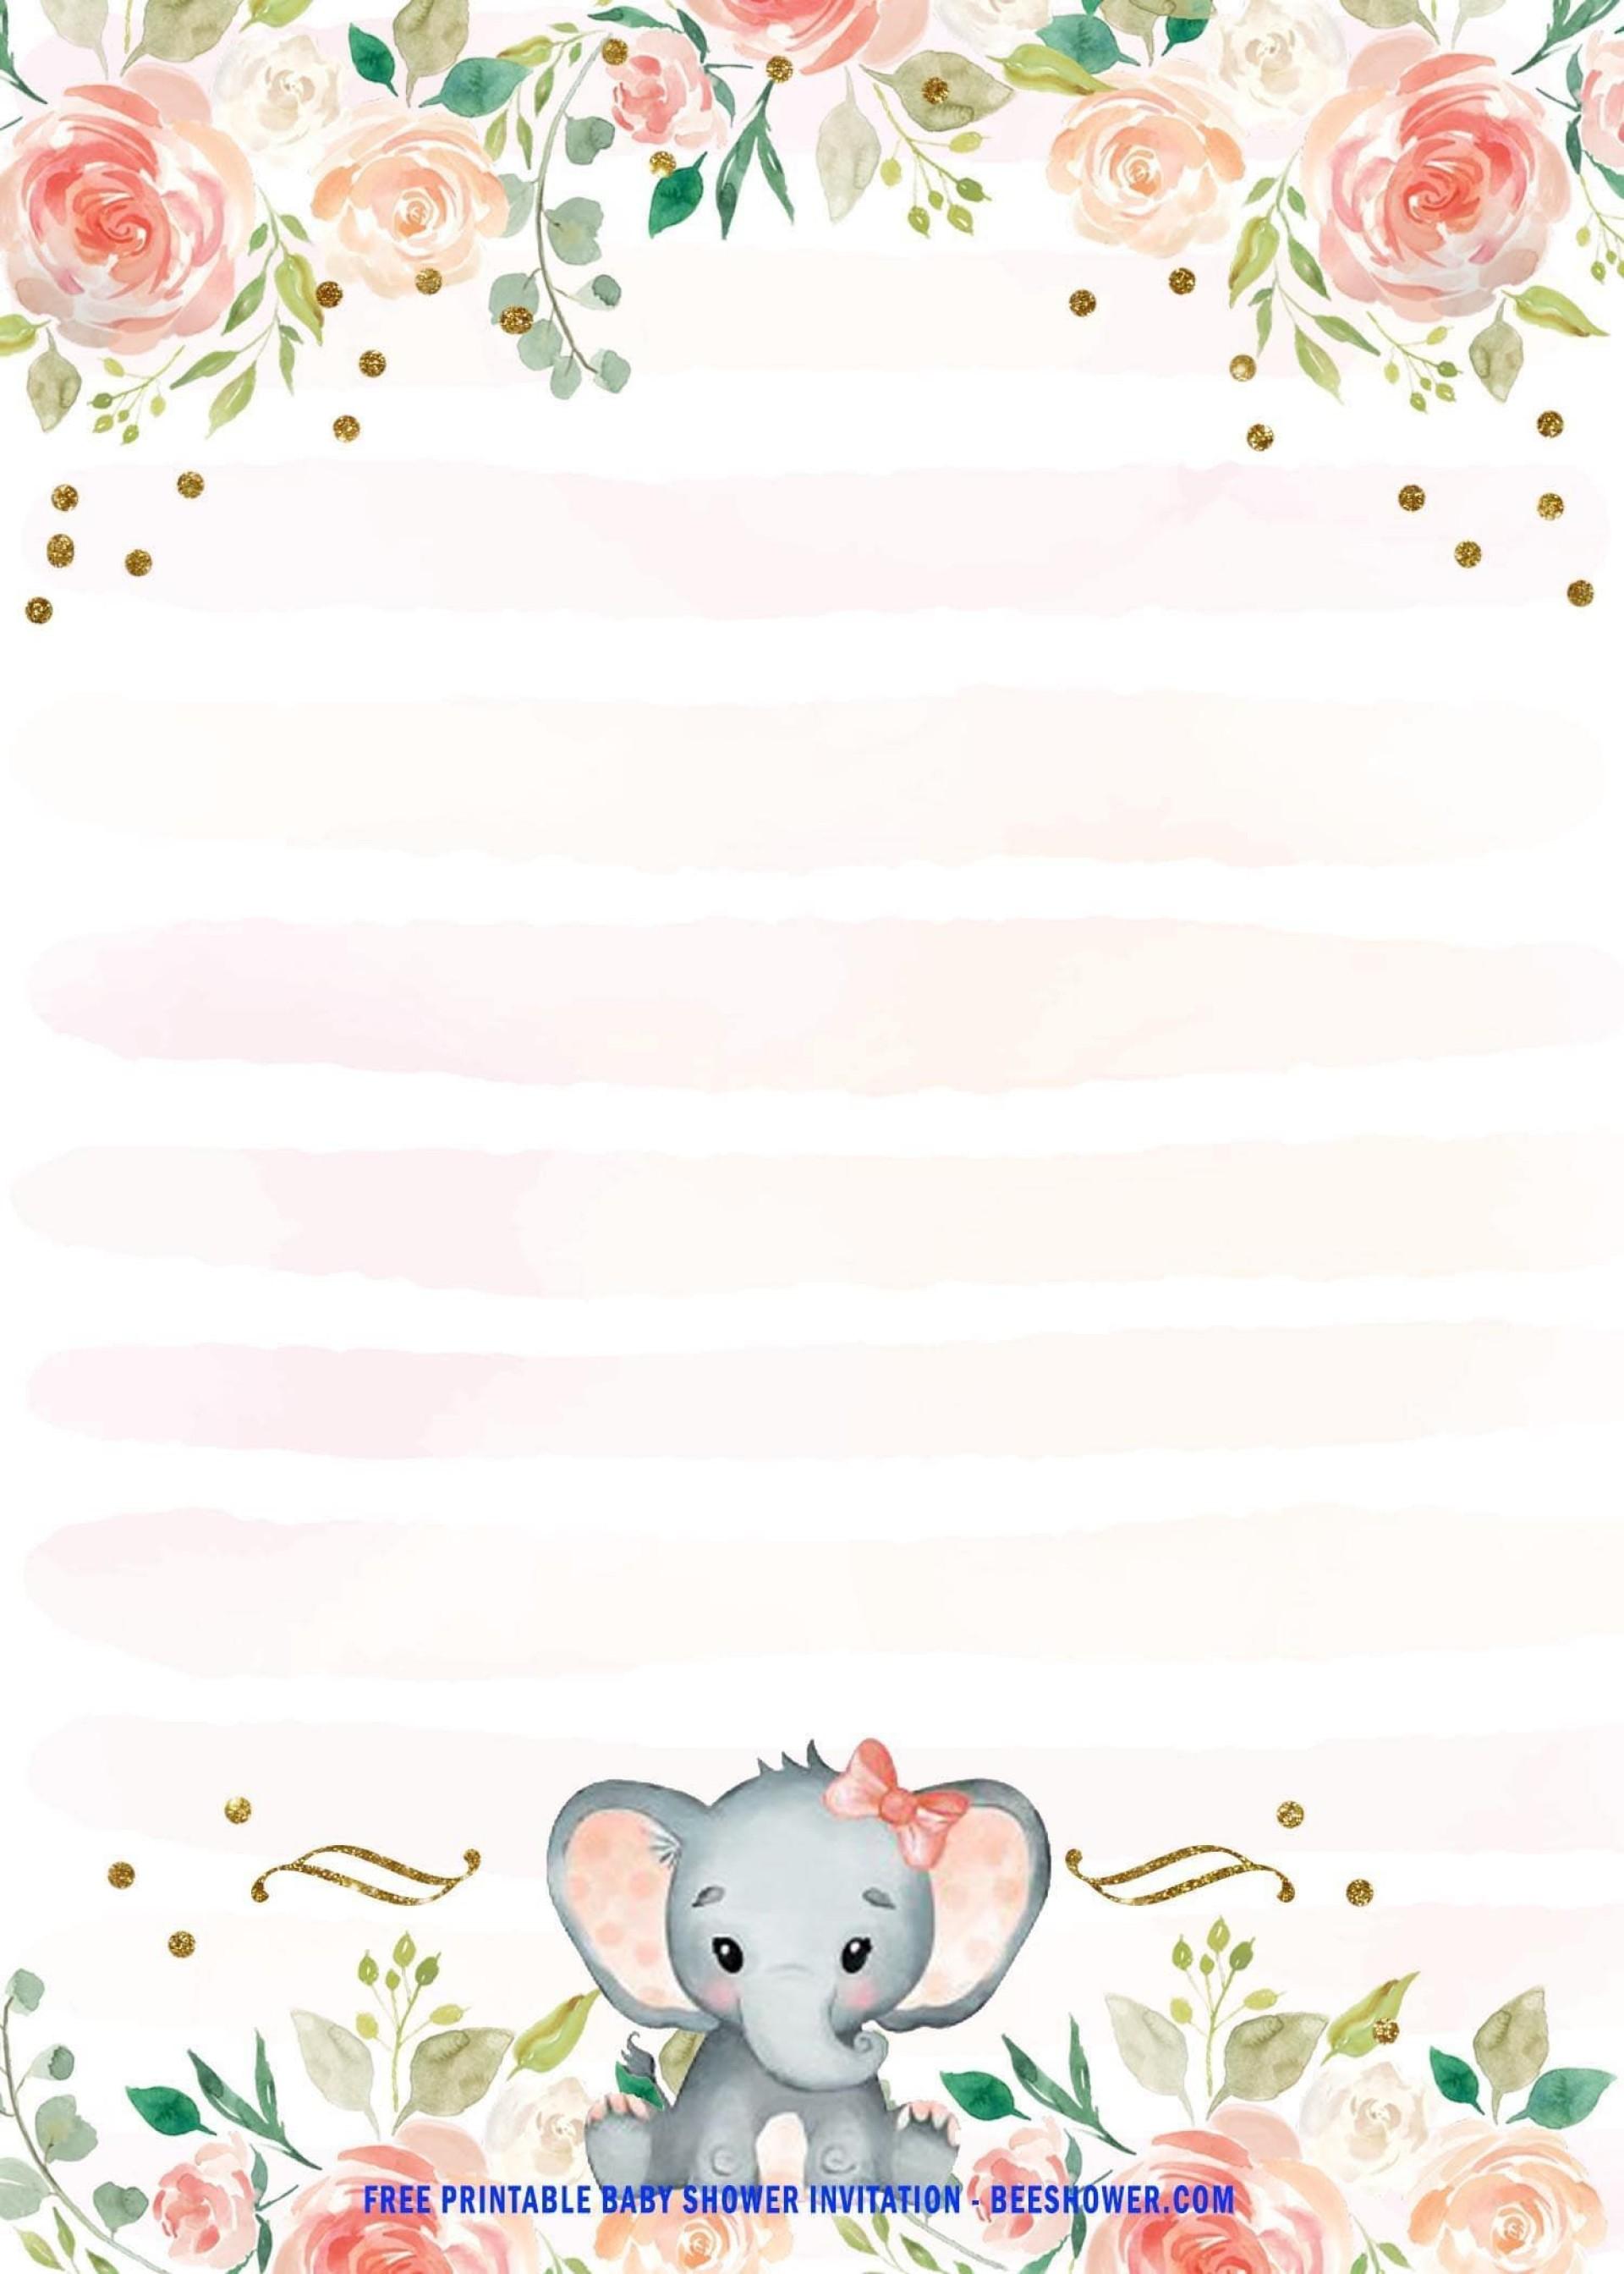 002 Wonderful Free Baby Shower Printable Elephant High Definition  Decoration1920